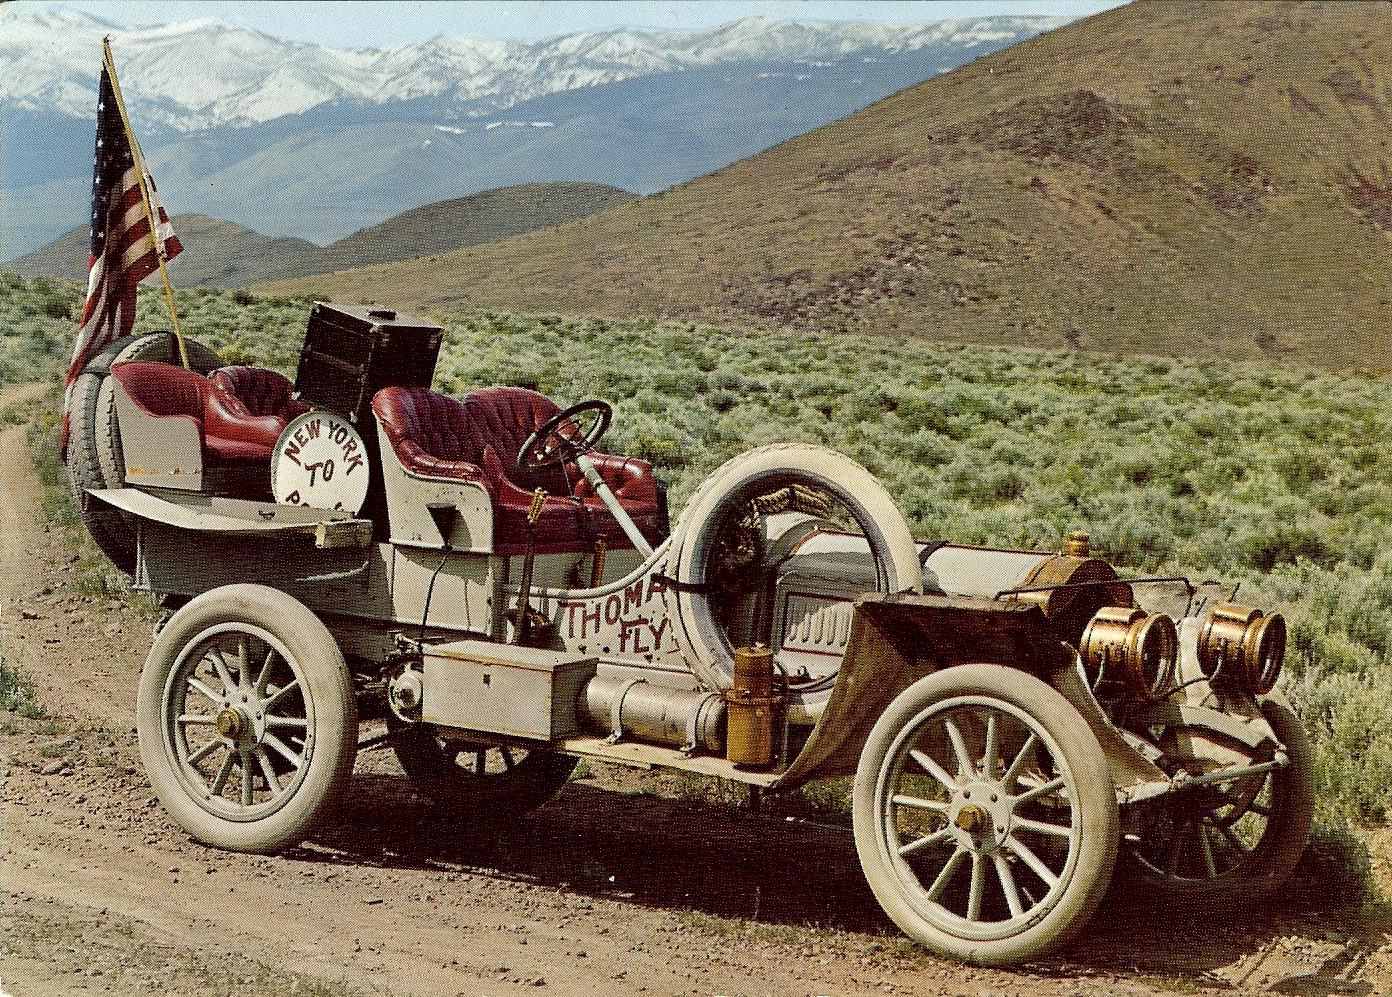 Utah Valley Old Car Club: NEW YORK TO PARIS WORLD RACE 2011